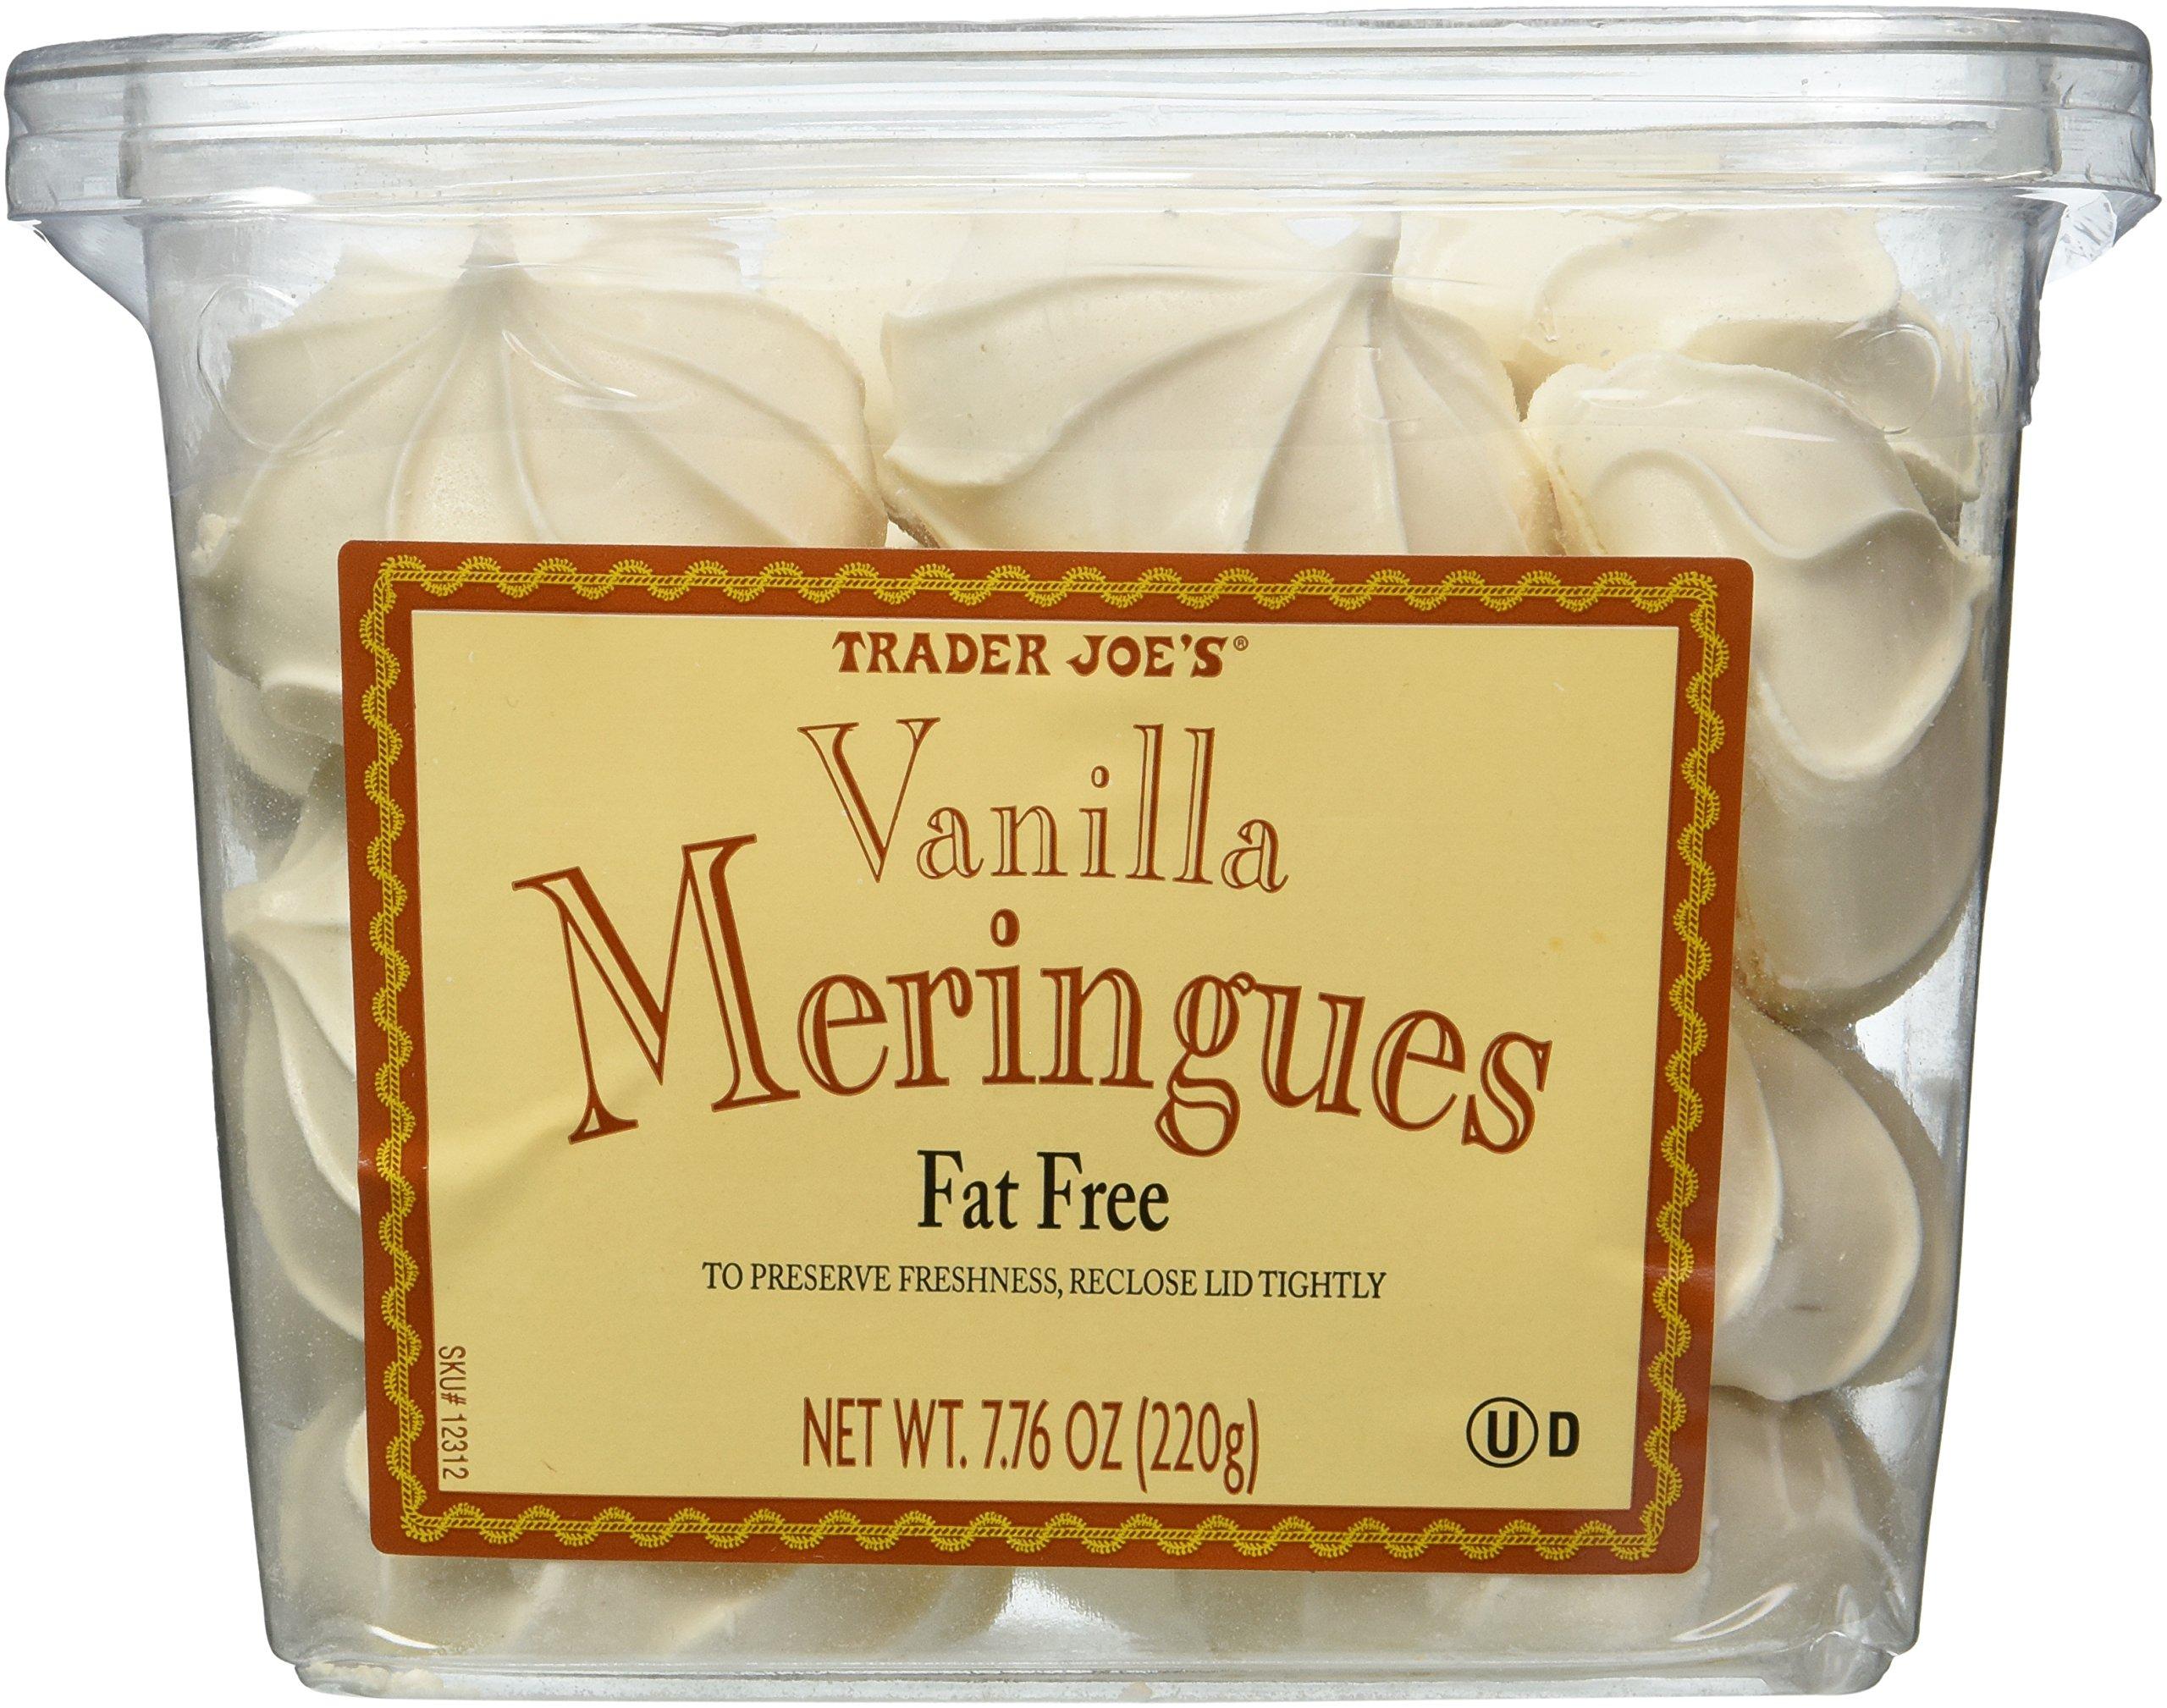 Trader Joe's Vanilla Meringues - Fat Free - 7.76oz (210g) - 2 PACK by